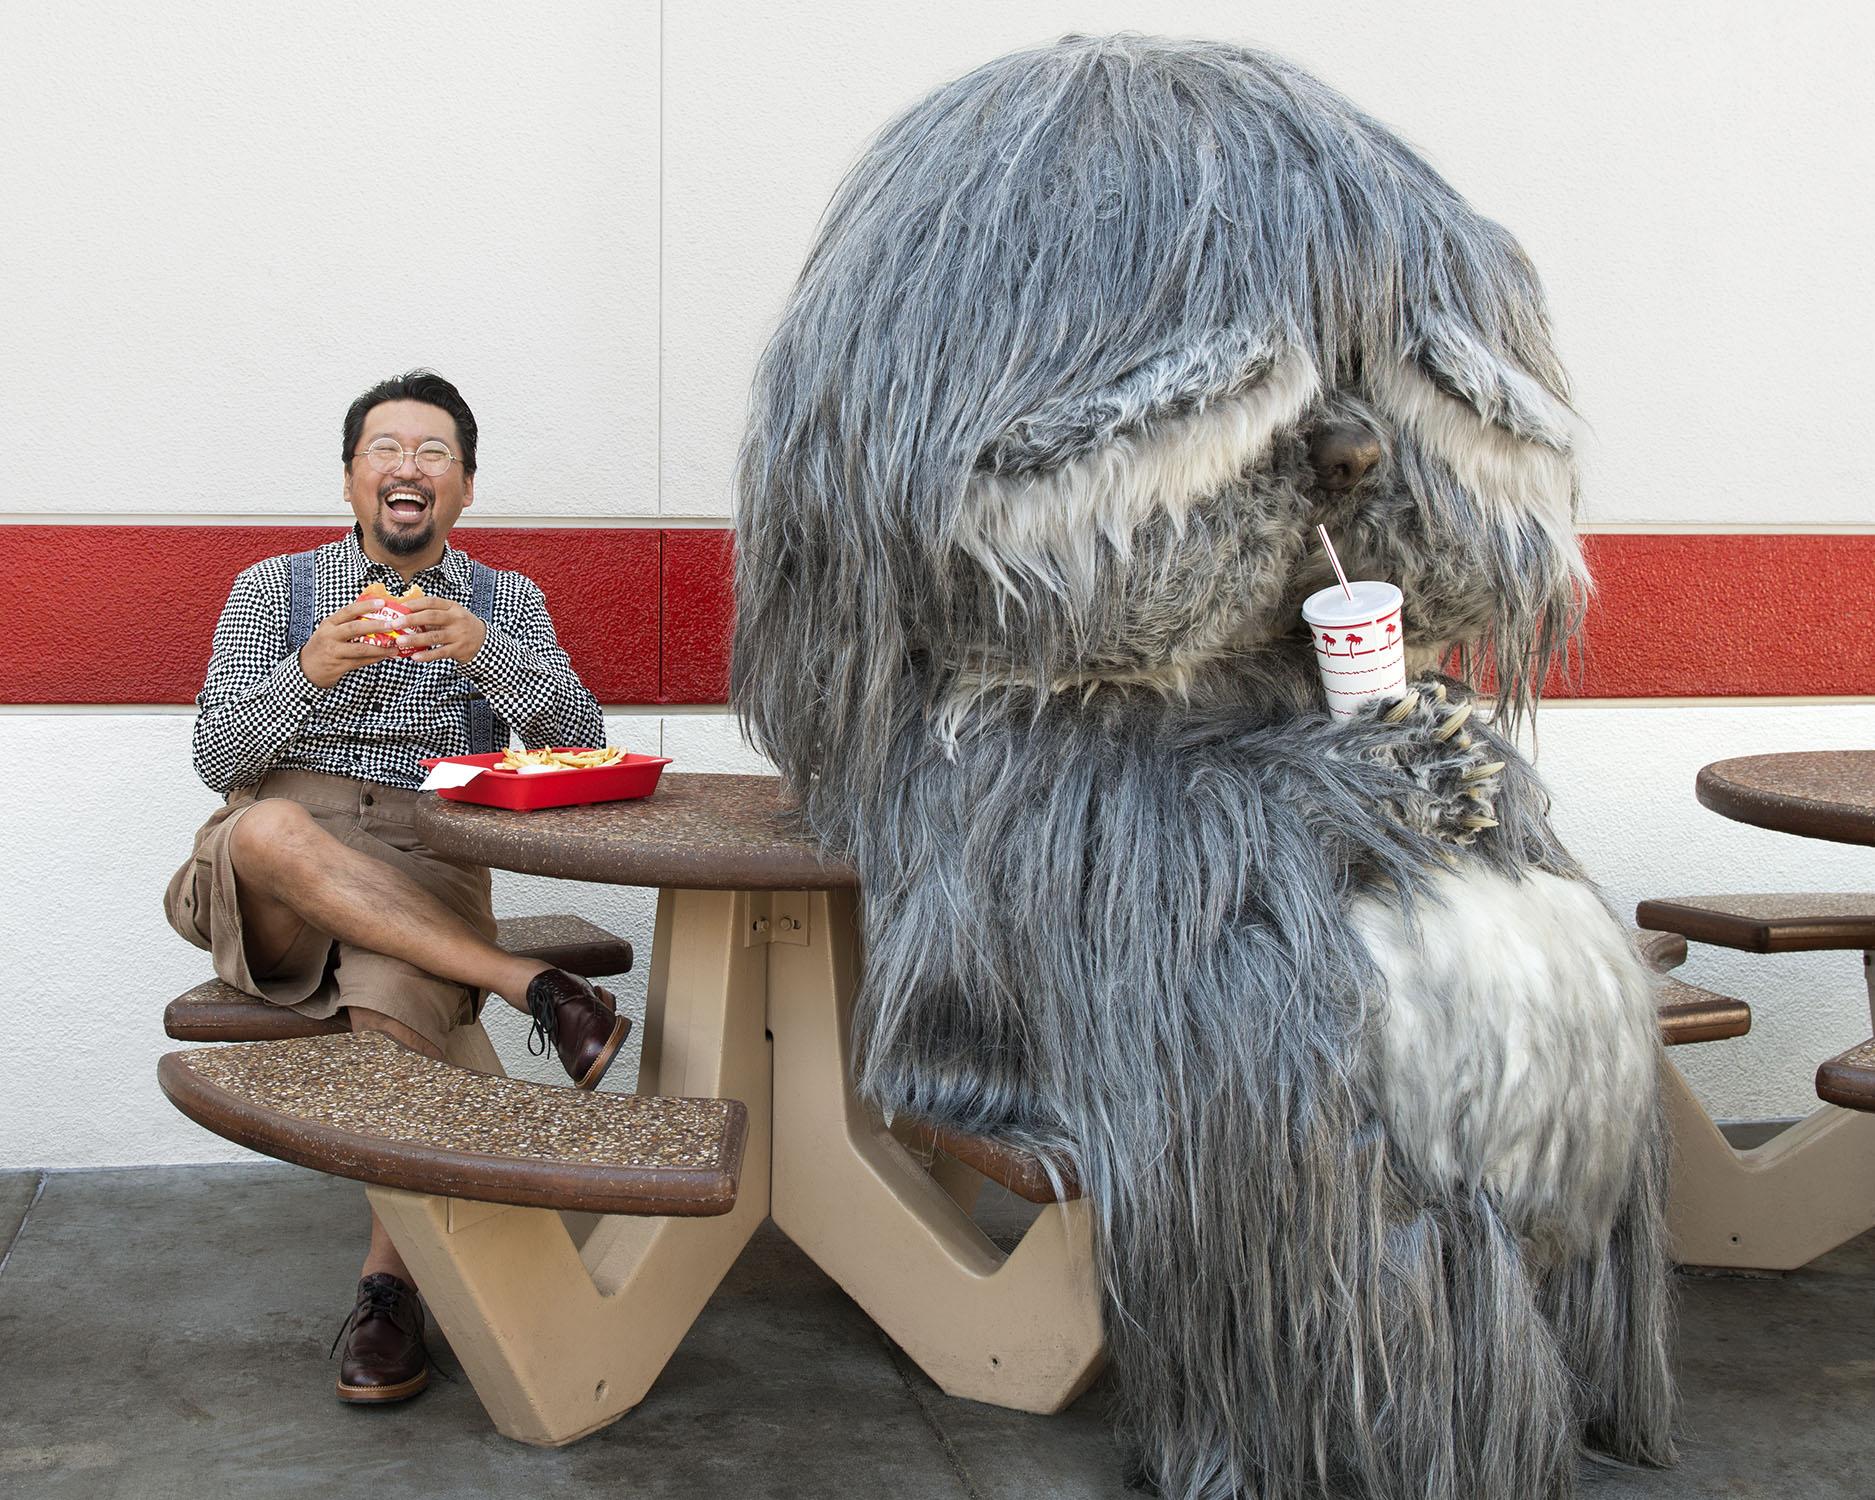 Takashi Murakami, 2013 Los Angeles, California